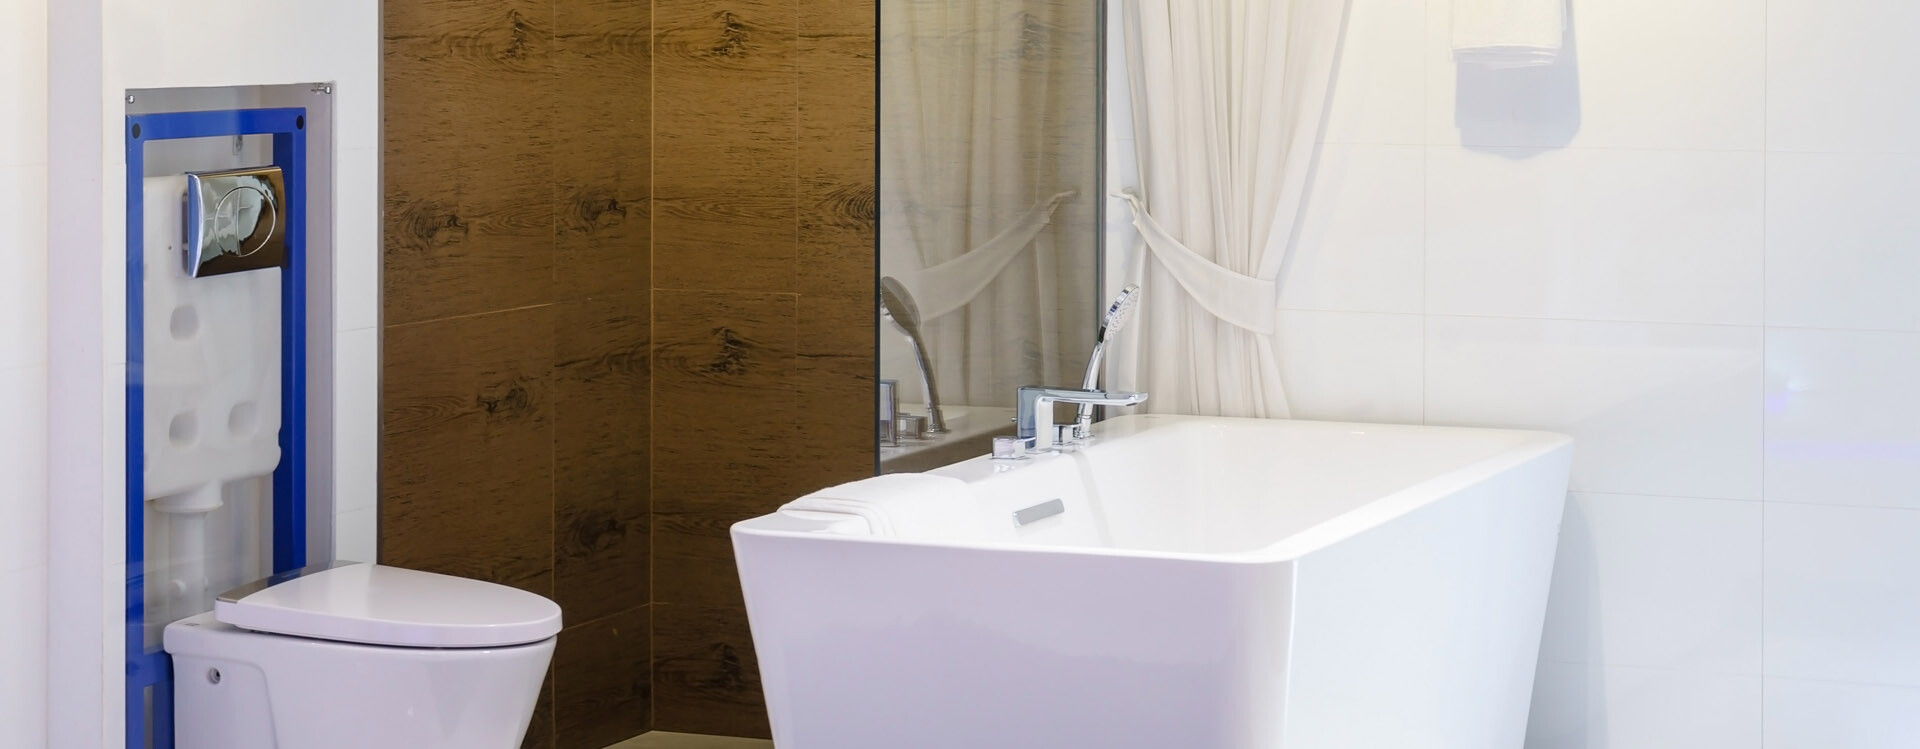 Master Bathroom Remodeling Ideas Friga Construction Inc